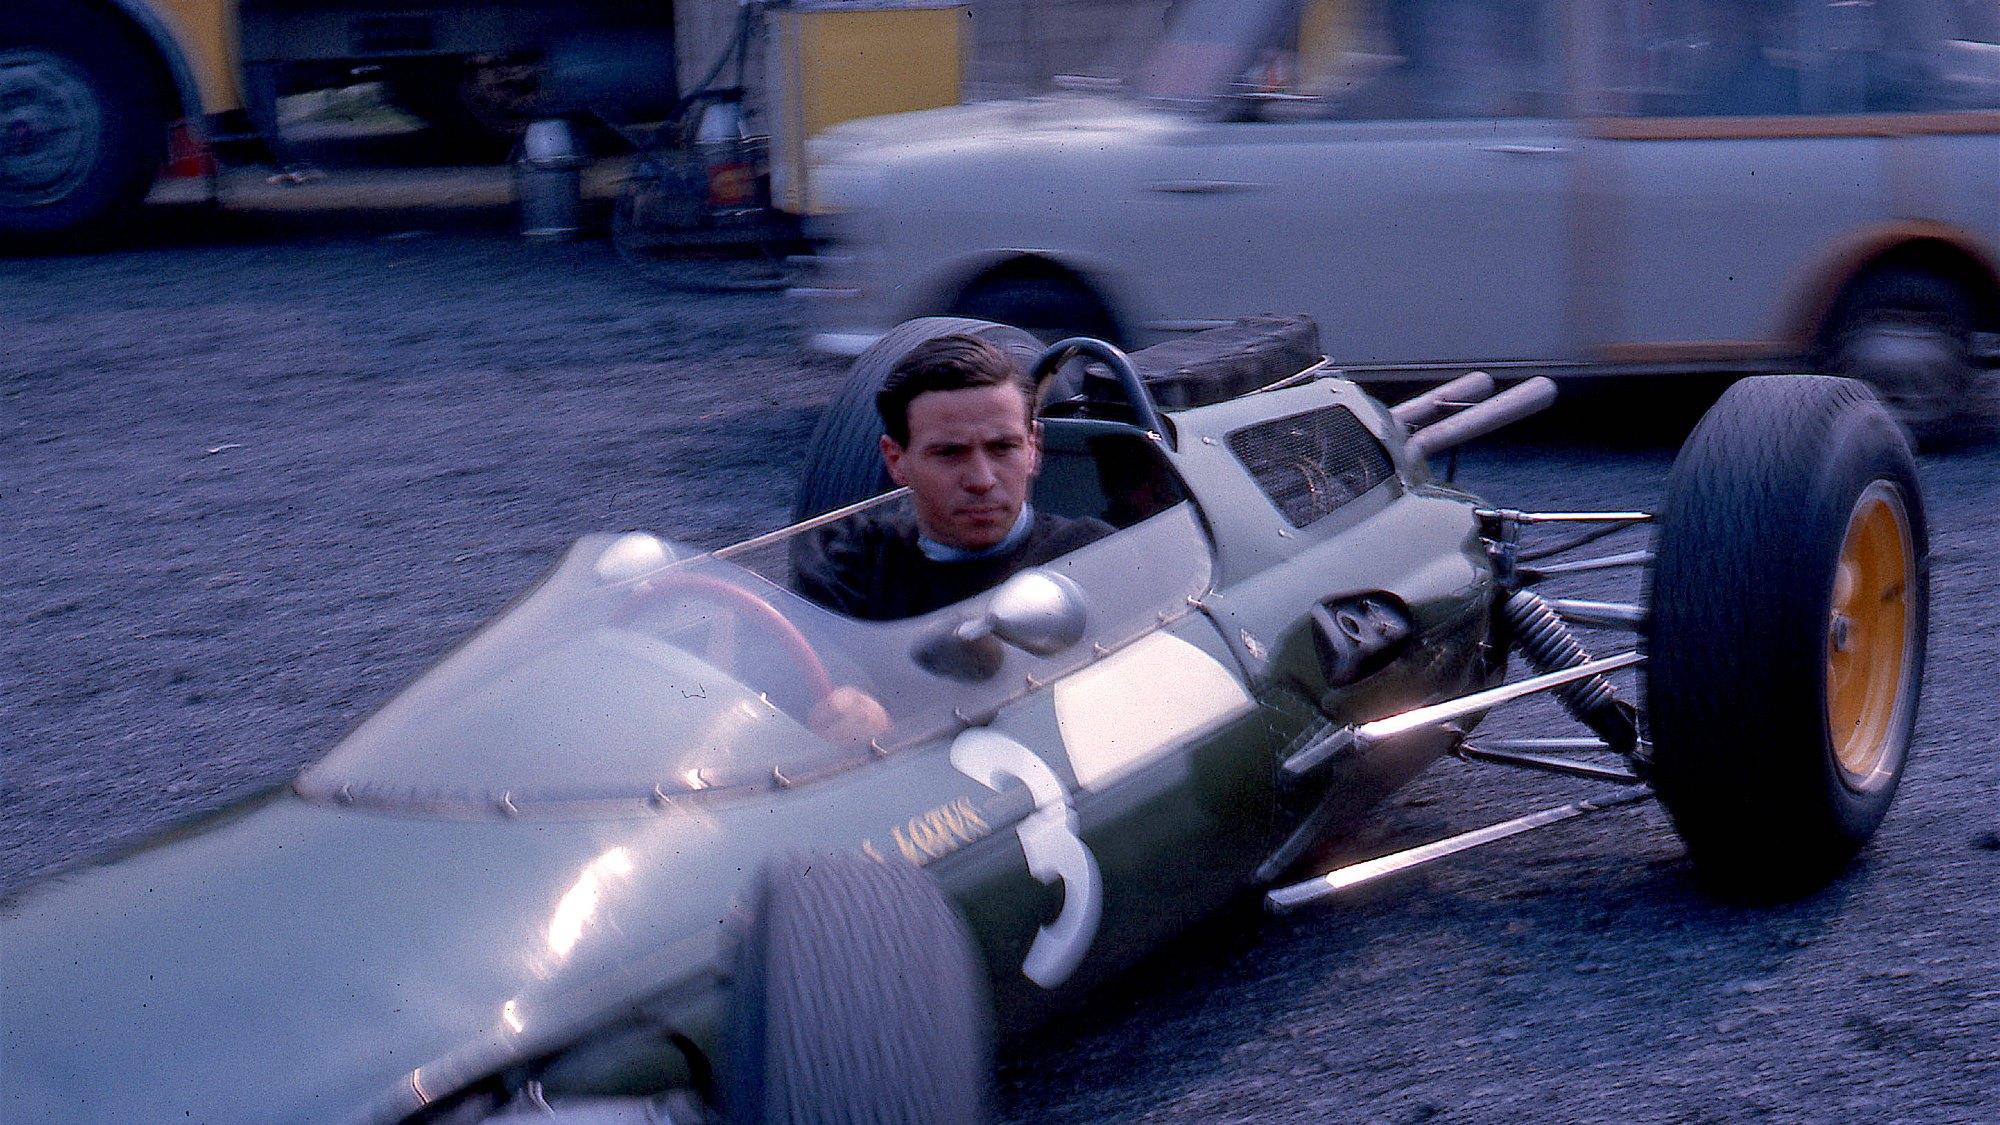 Jim clark and Lotus 25 at Aintree in 1963